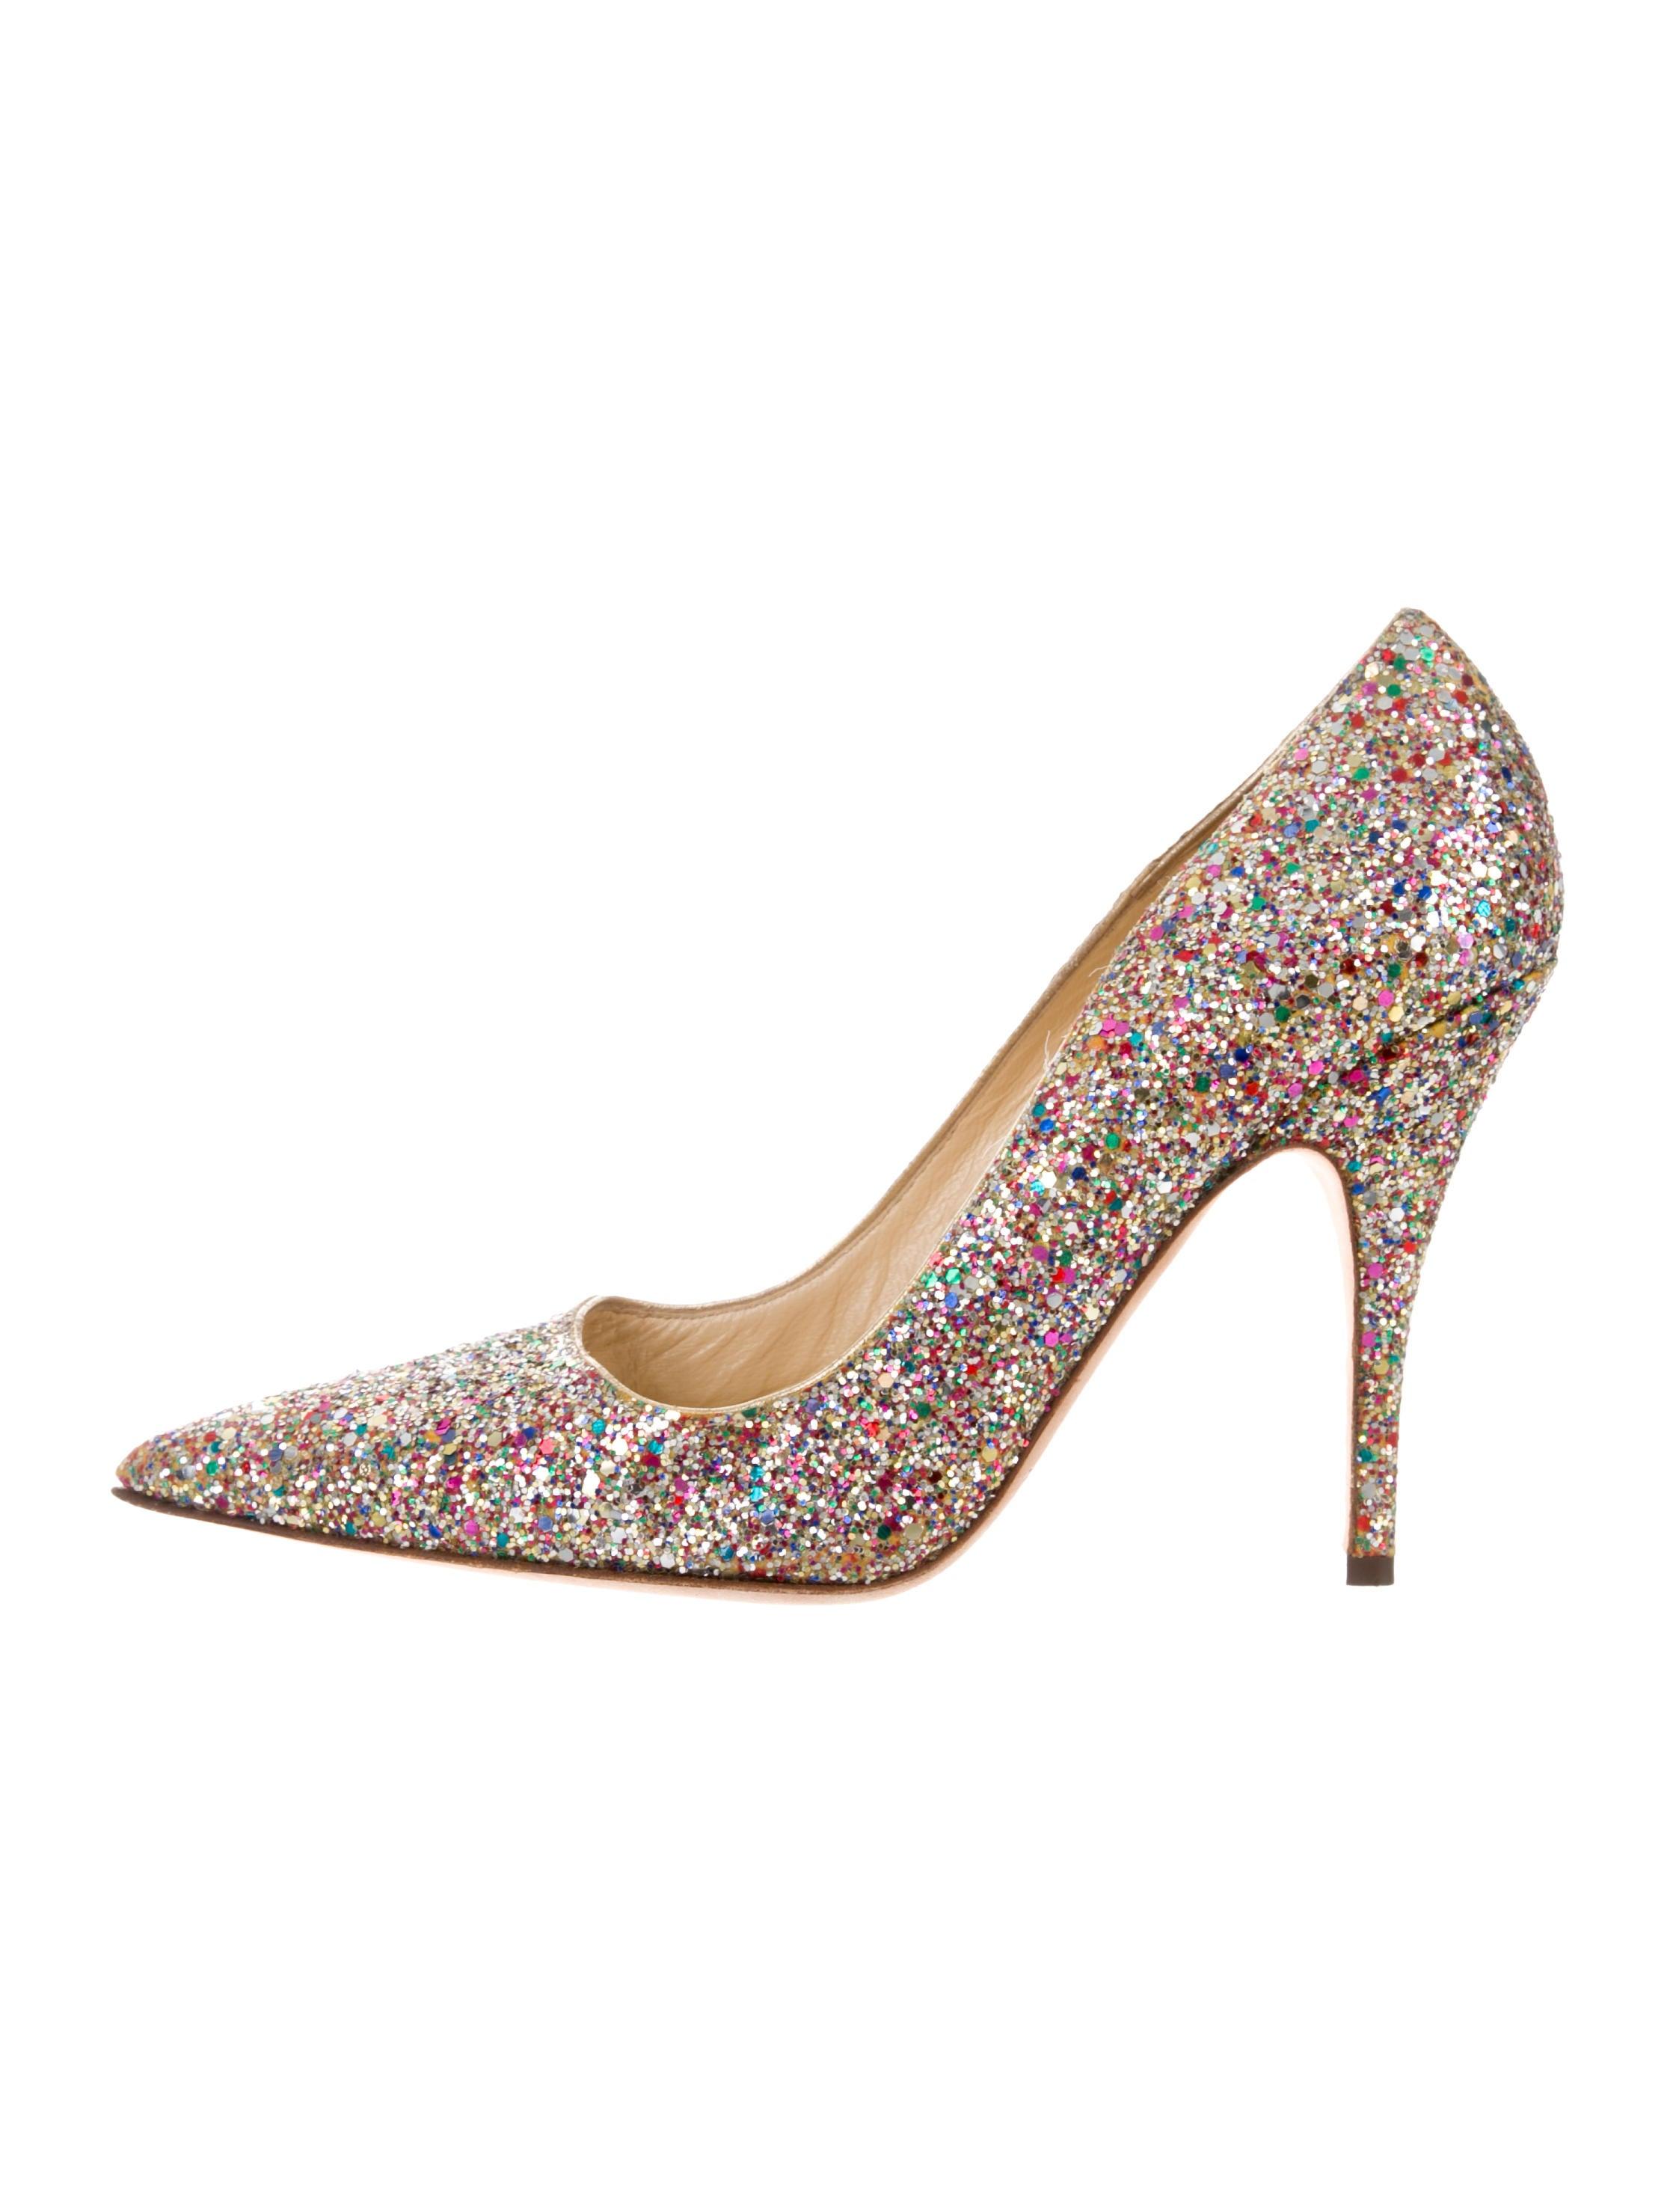 c3c8e8d24c45 Kate Spade New York Licorice Too Glitter Pumps - Shoes - WKA87525 ...